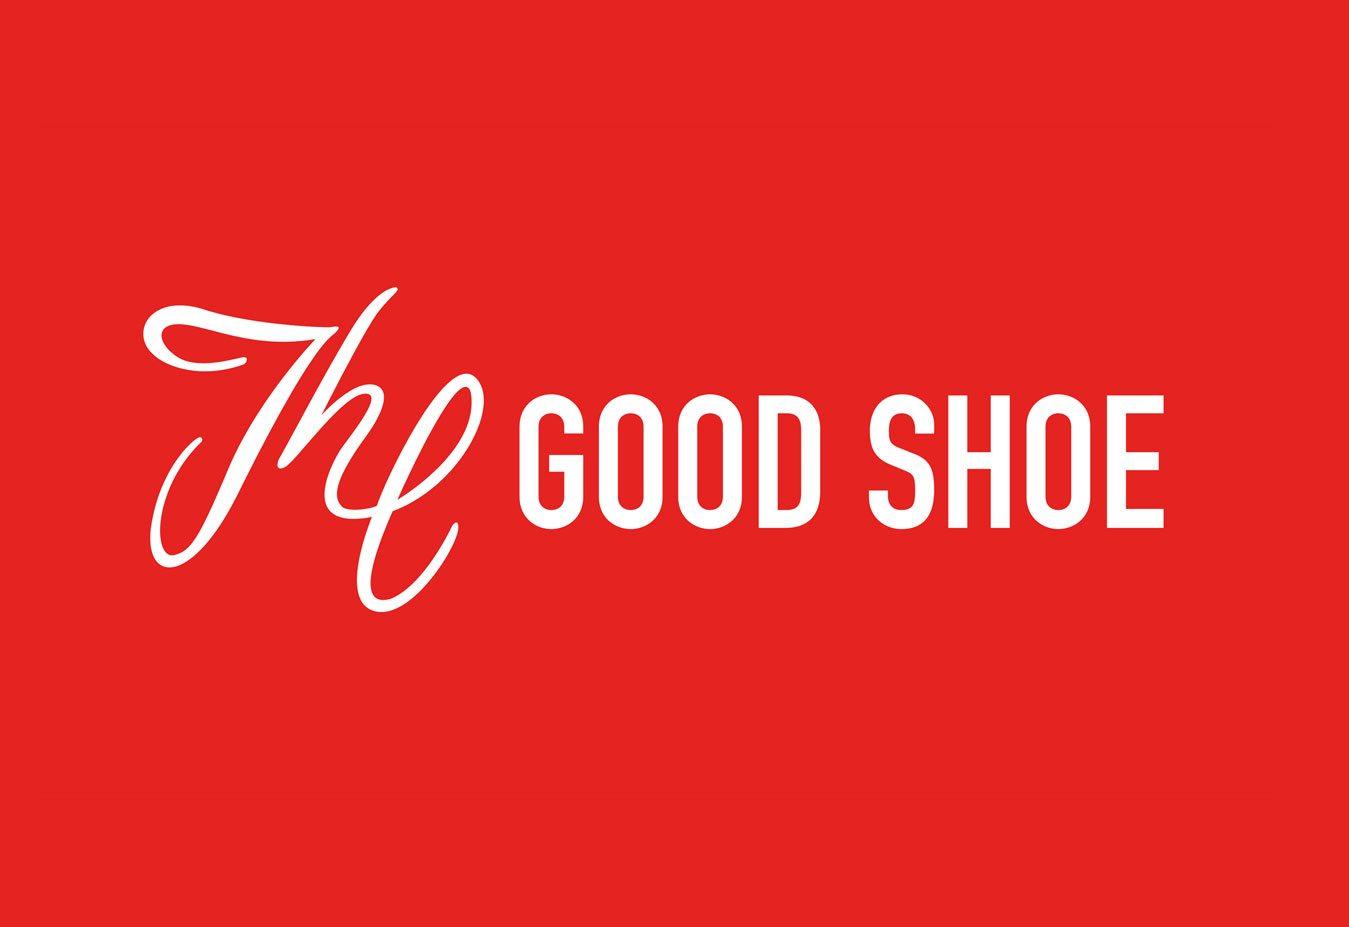 Grenson The Good Shoe Logo design